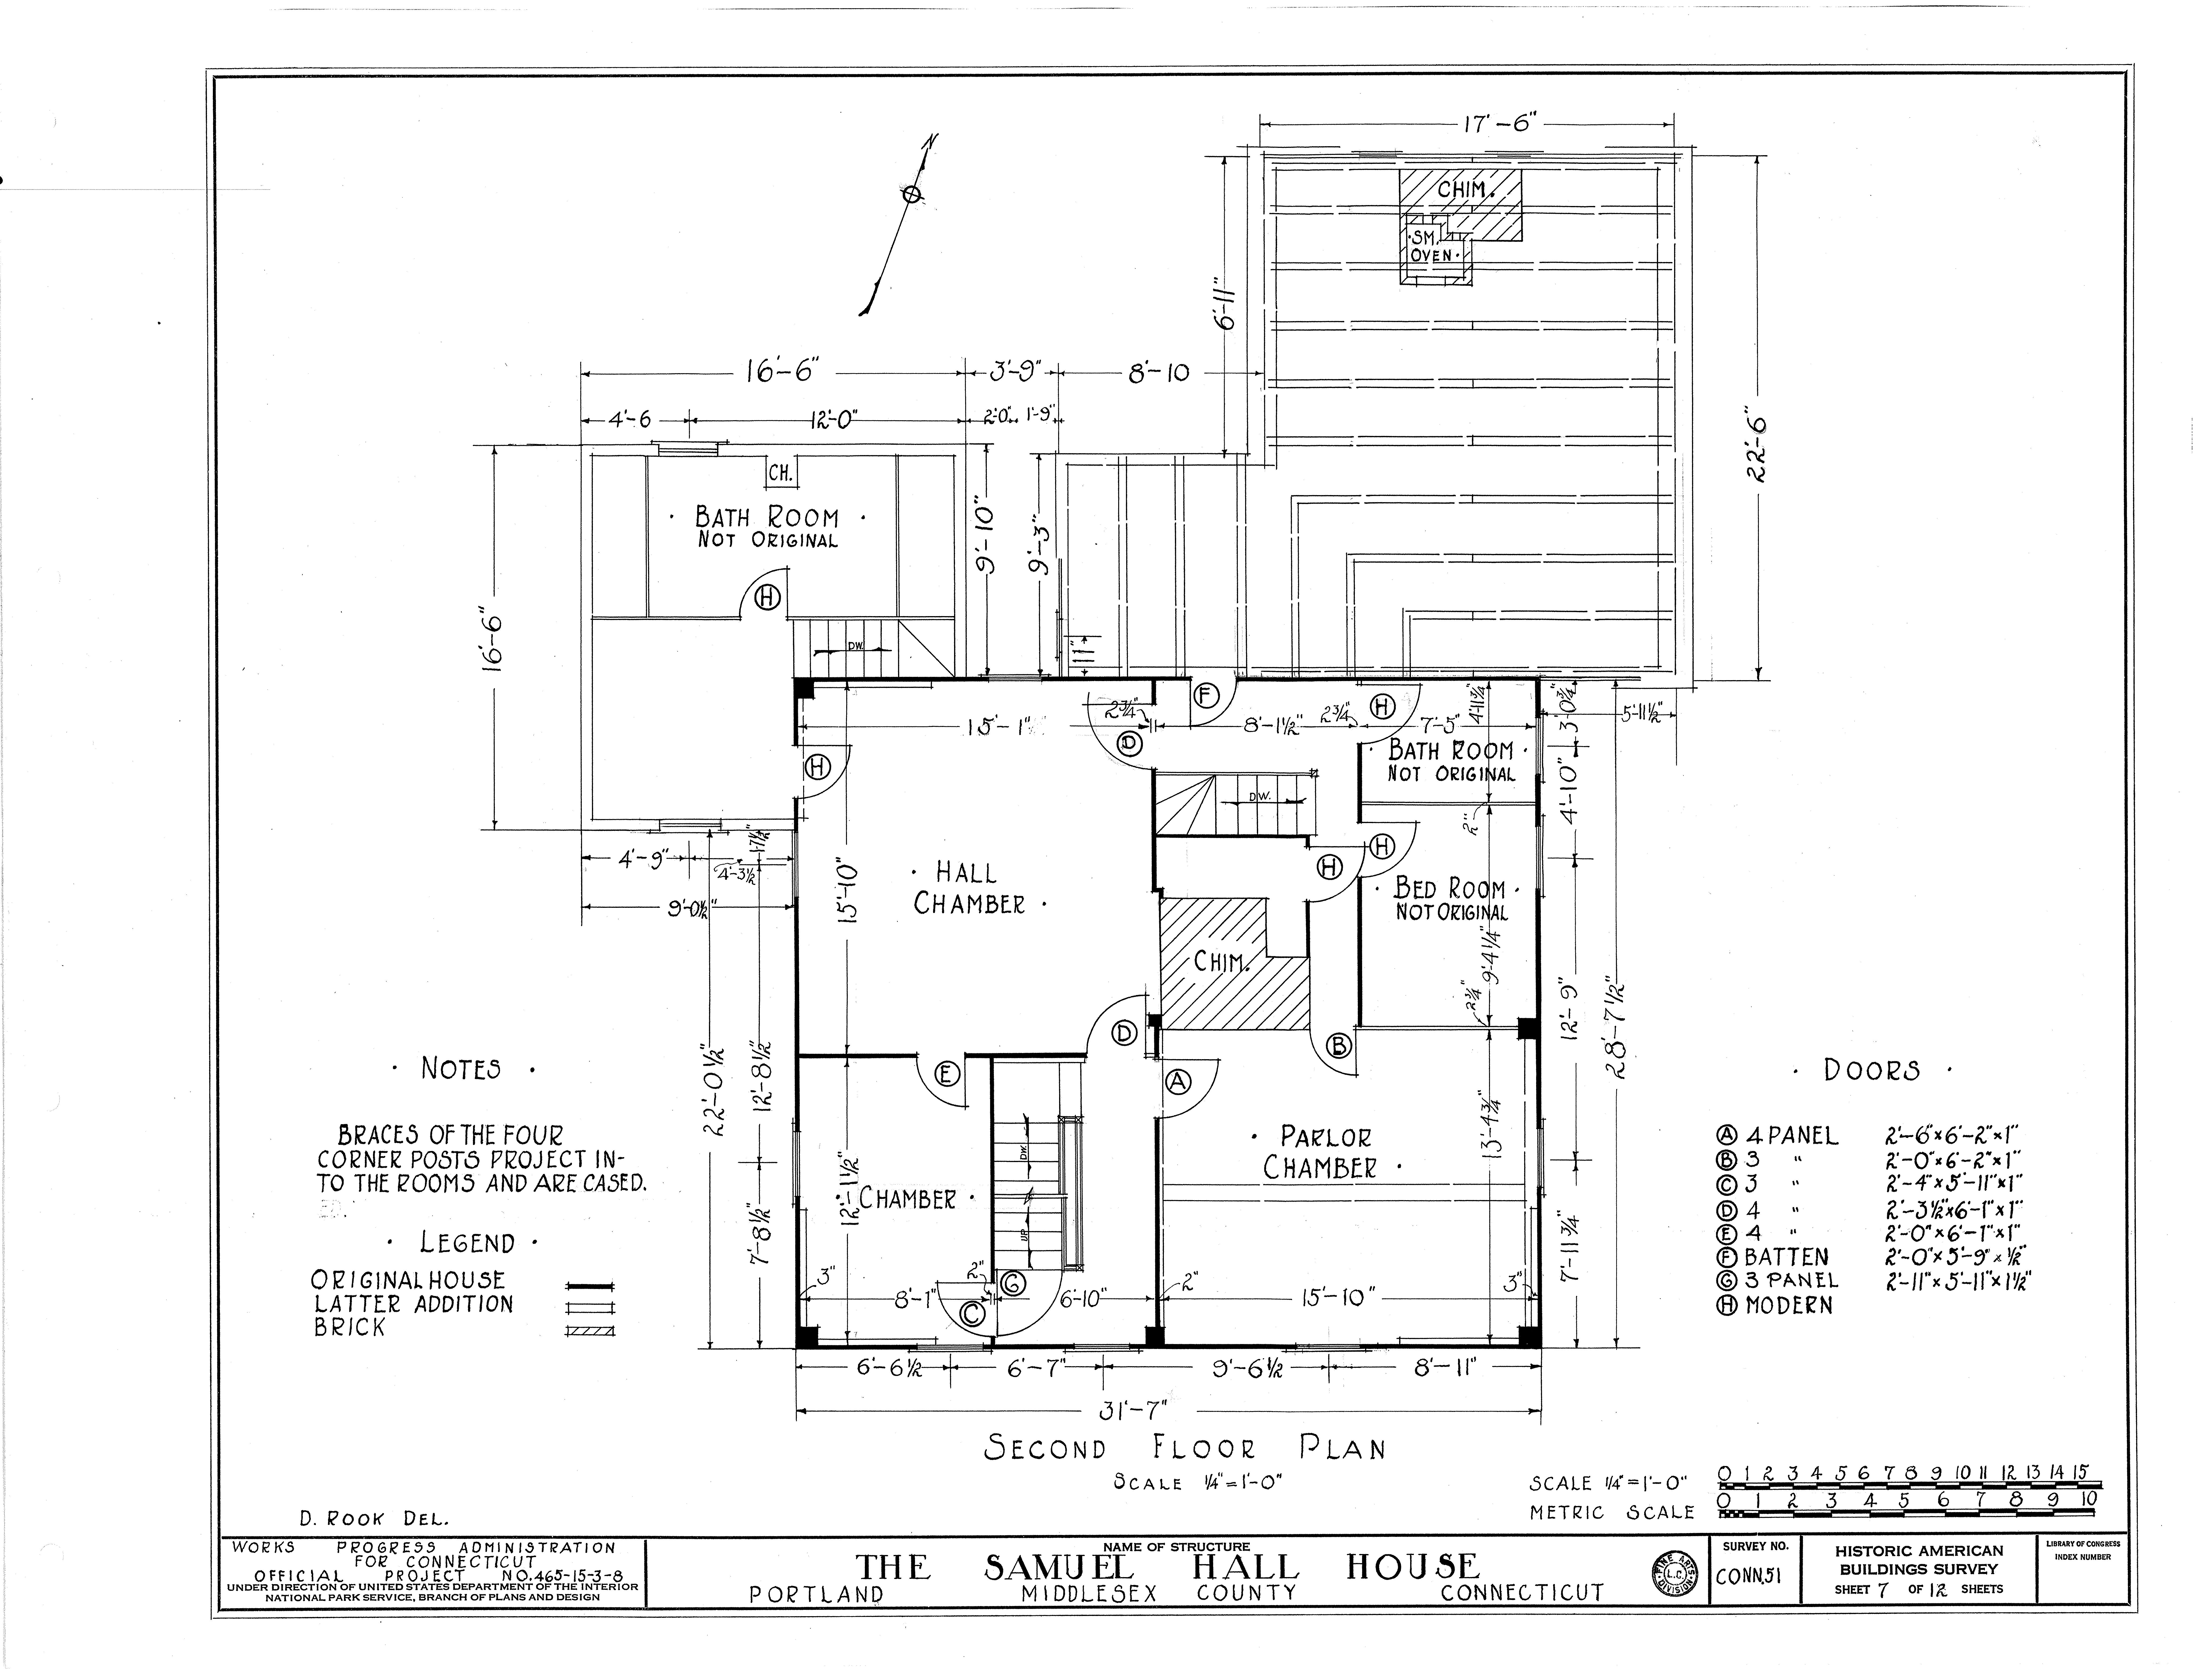 9352x7136 Filesamuel Hall House, 478 Main Street, Portland, Middlesex